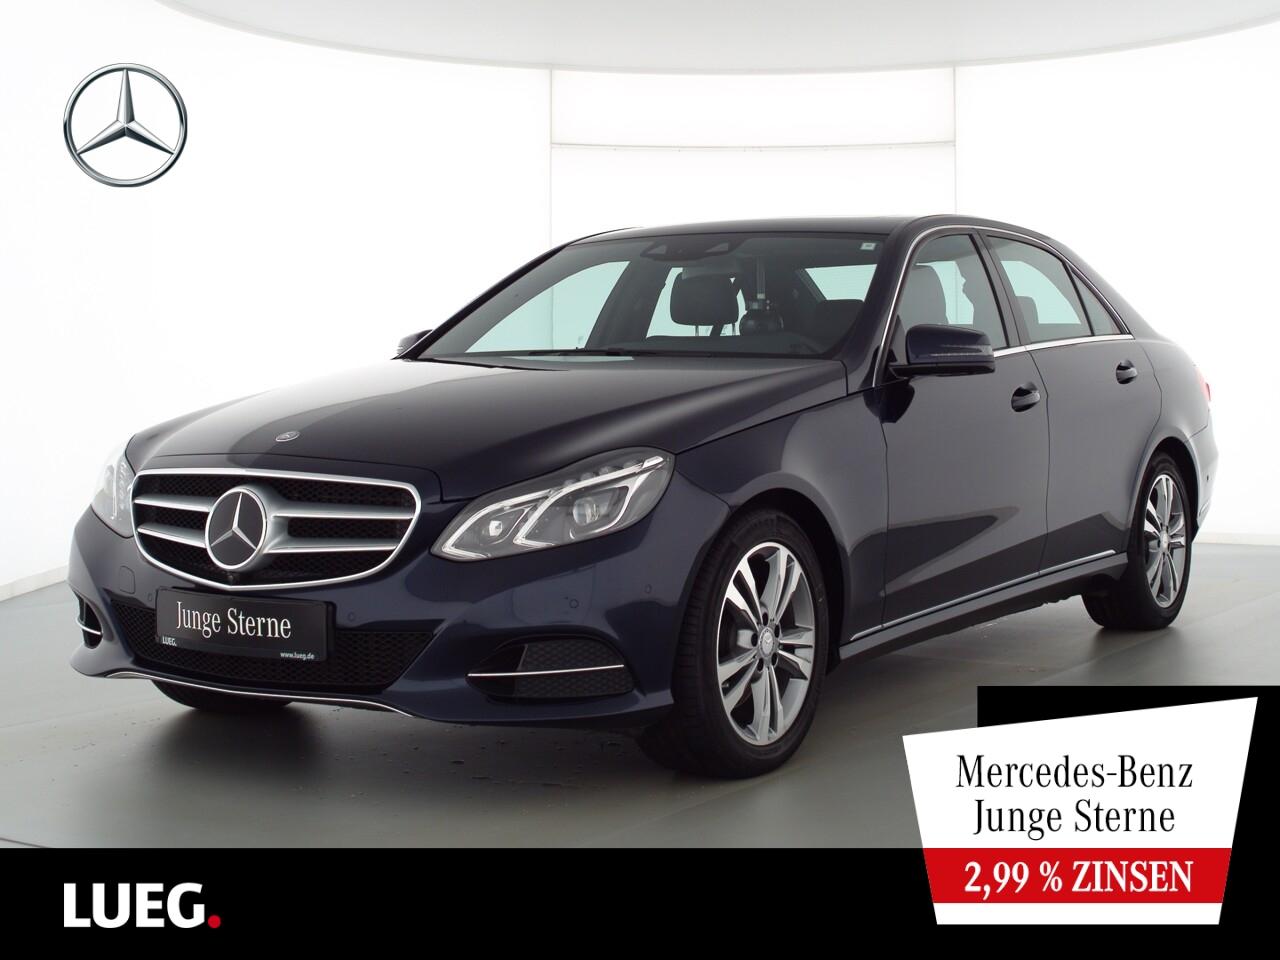 Mercedes-Benz E 350 BT Avantgarde+COM+SHD+Burm+LED+Sitzkl+360°, Jahr 2016, Diesel